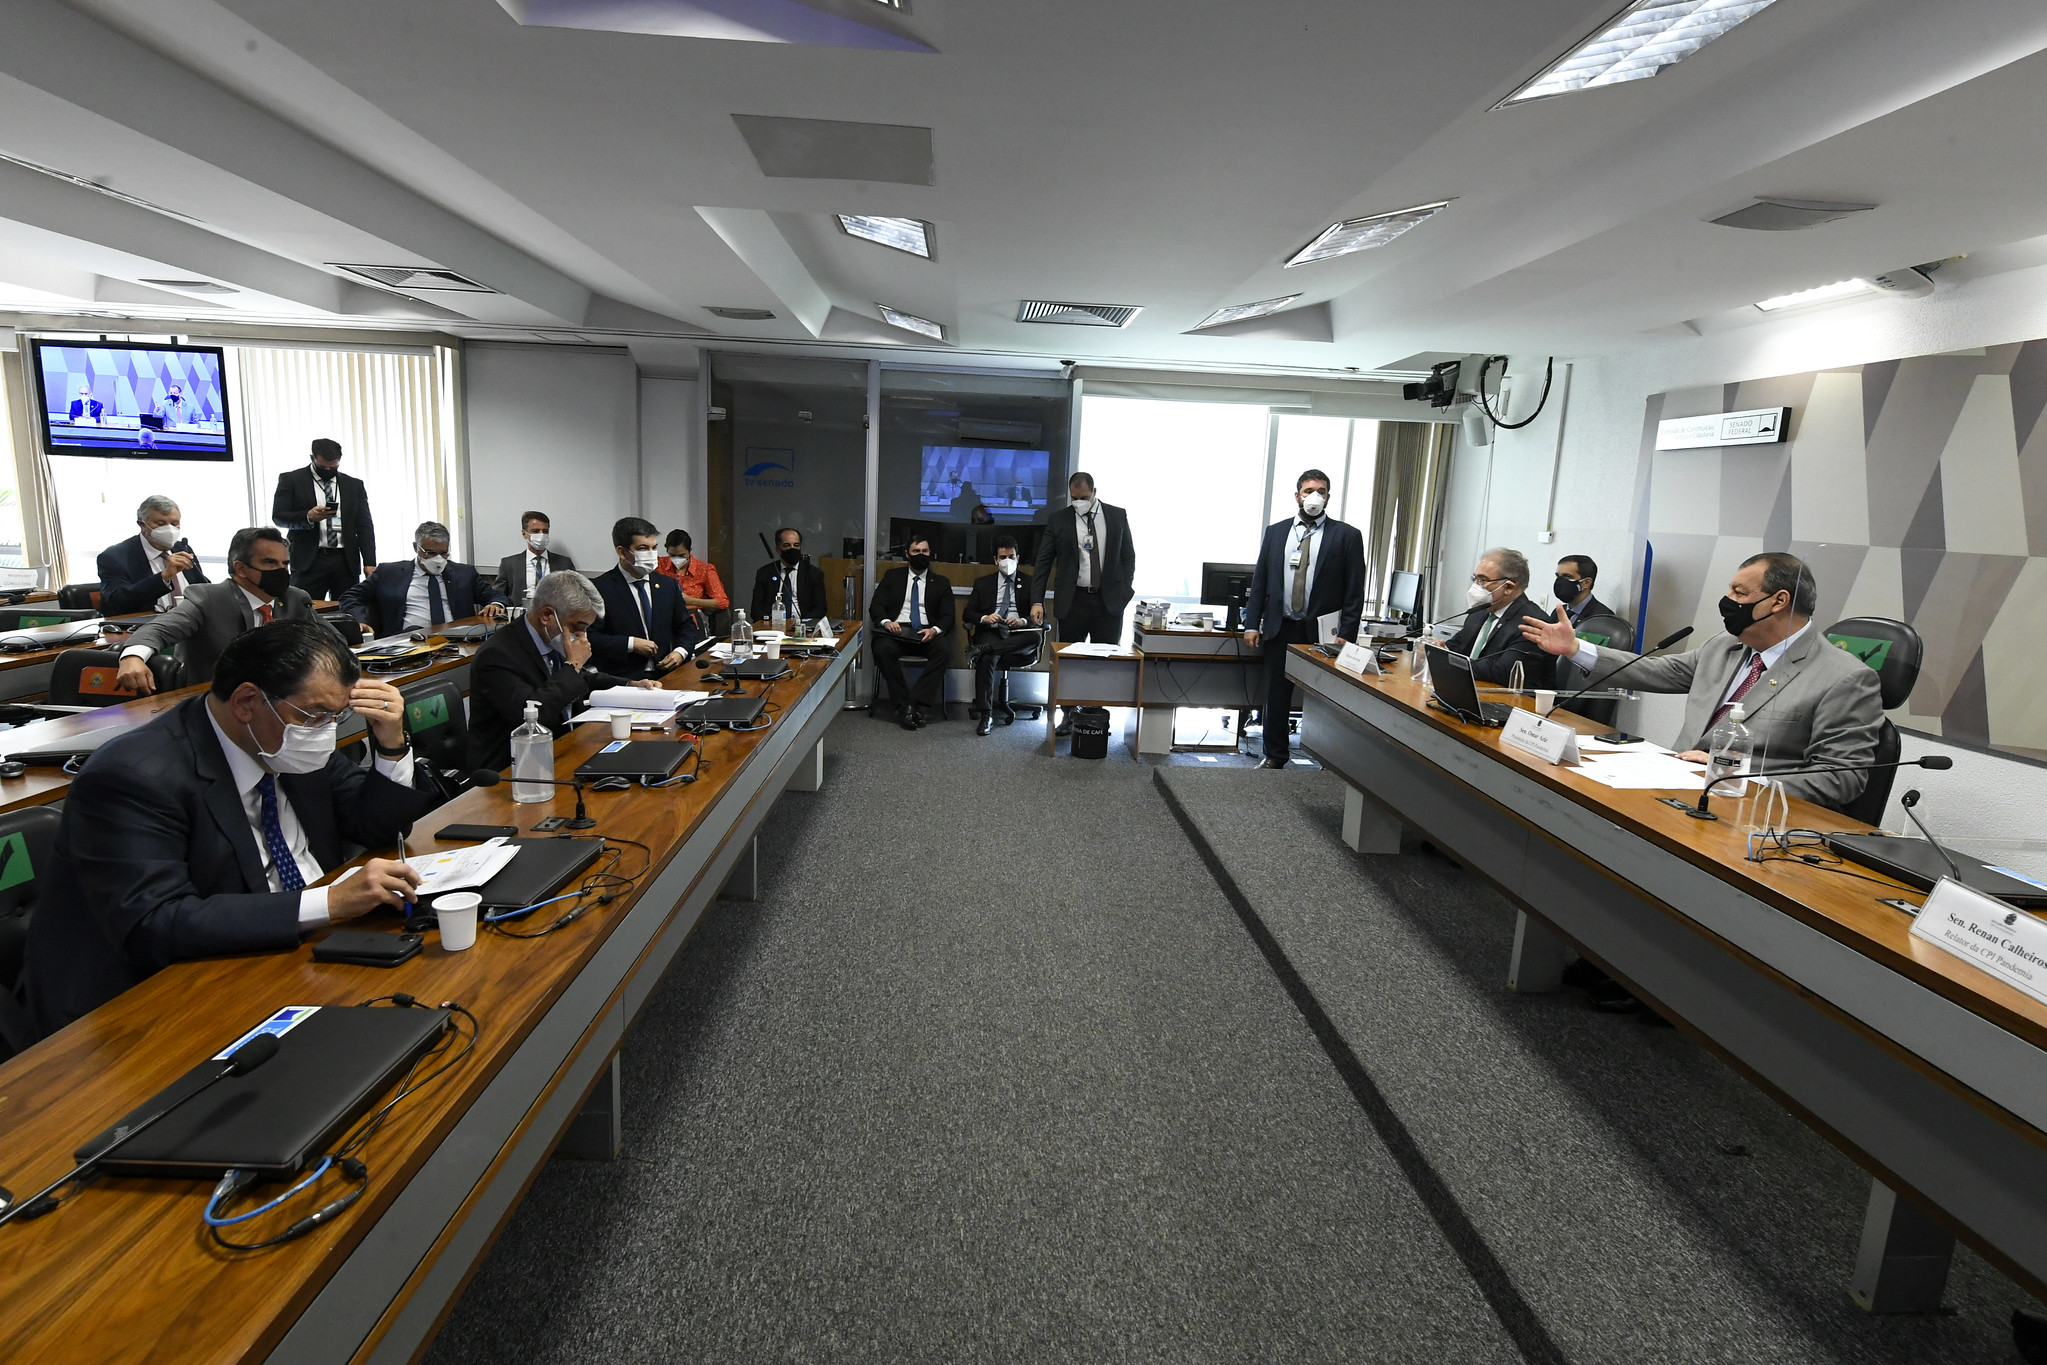 Ministro da Saúde, Marcelo Queiroga, presta depoimento na CPI da Pandemia